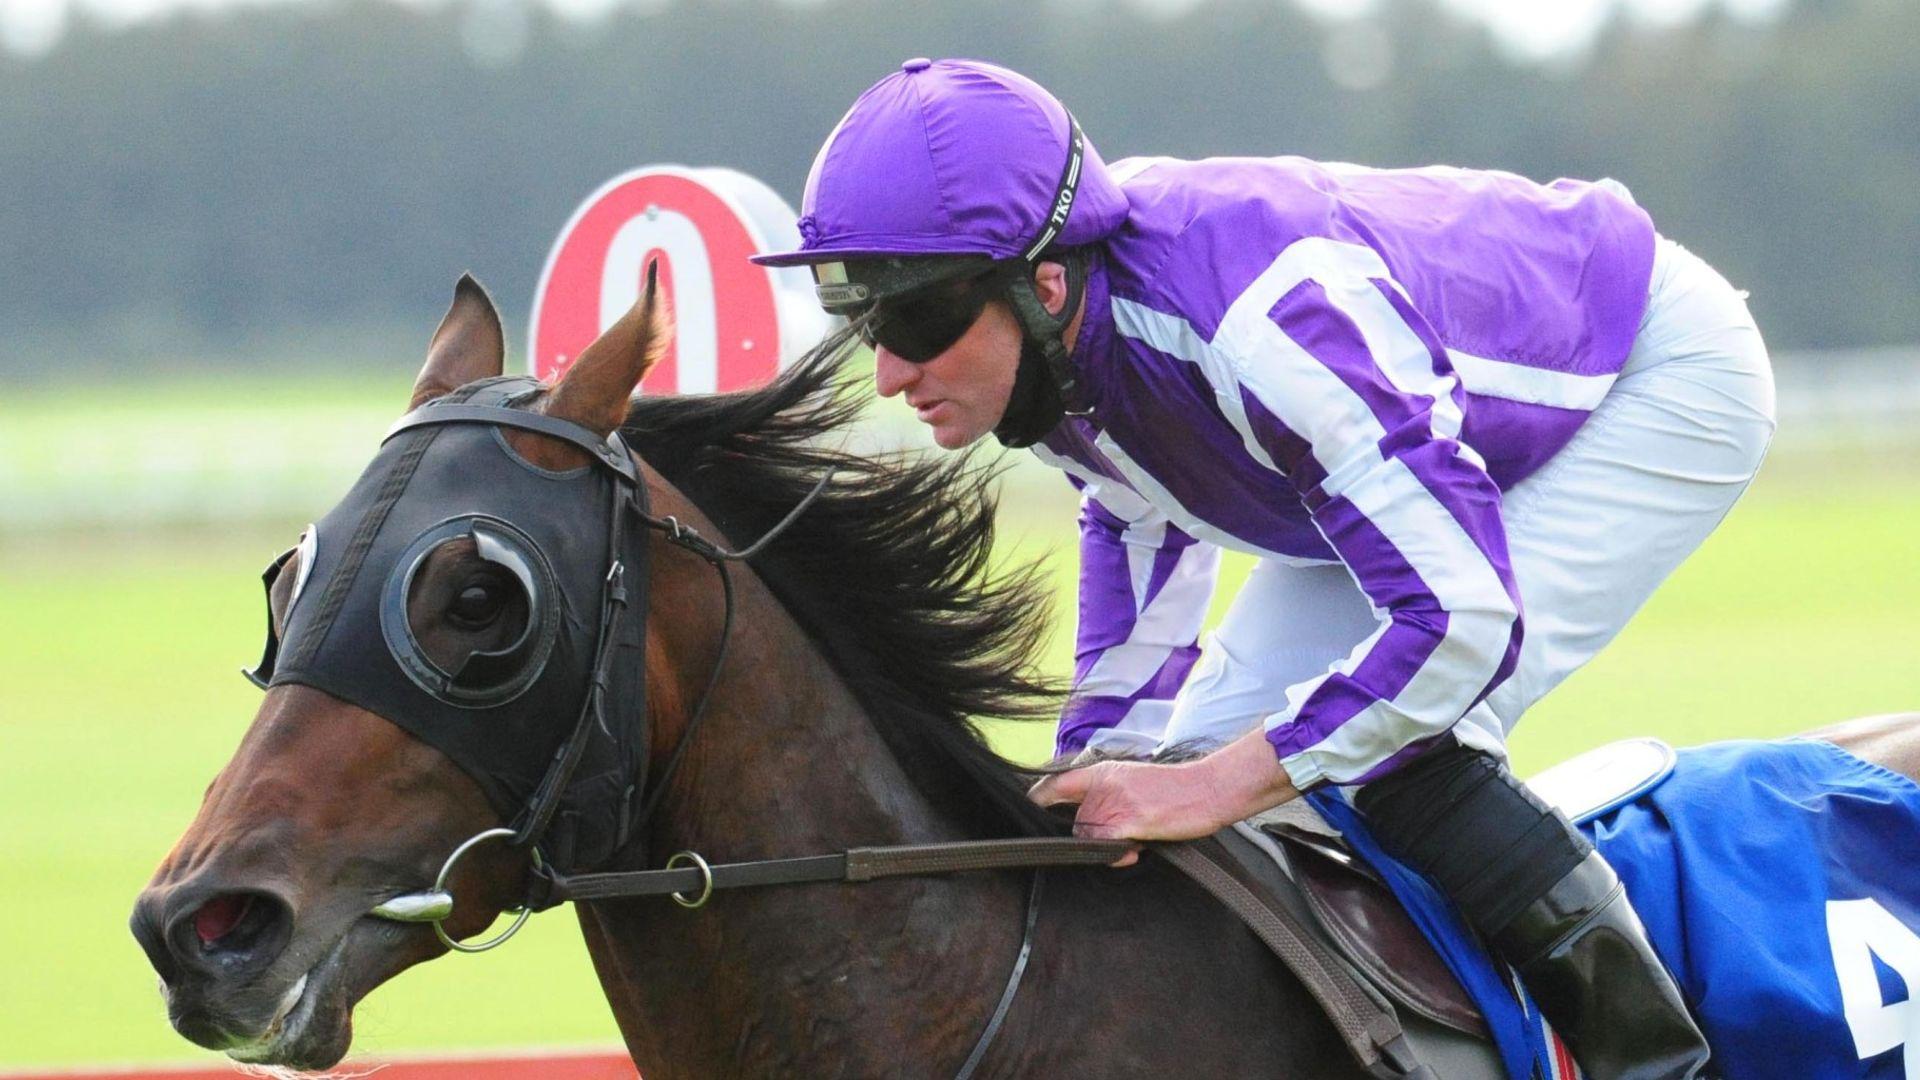 Order Of Australia suffers career-ending injury